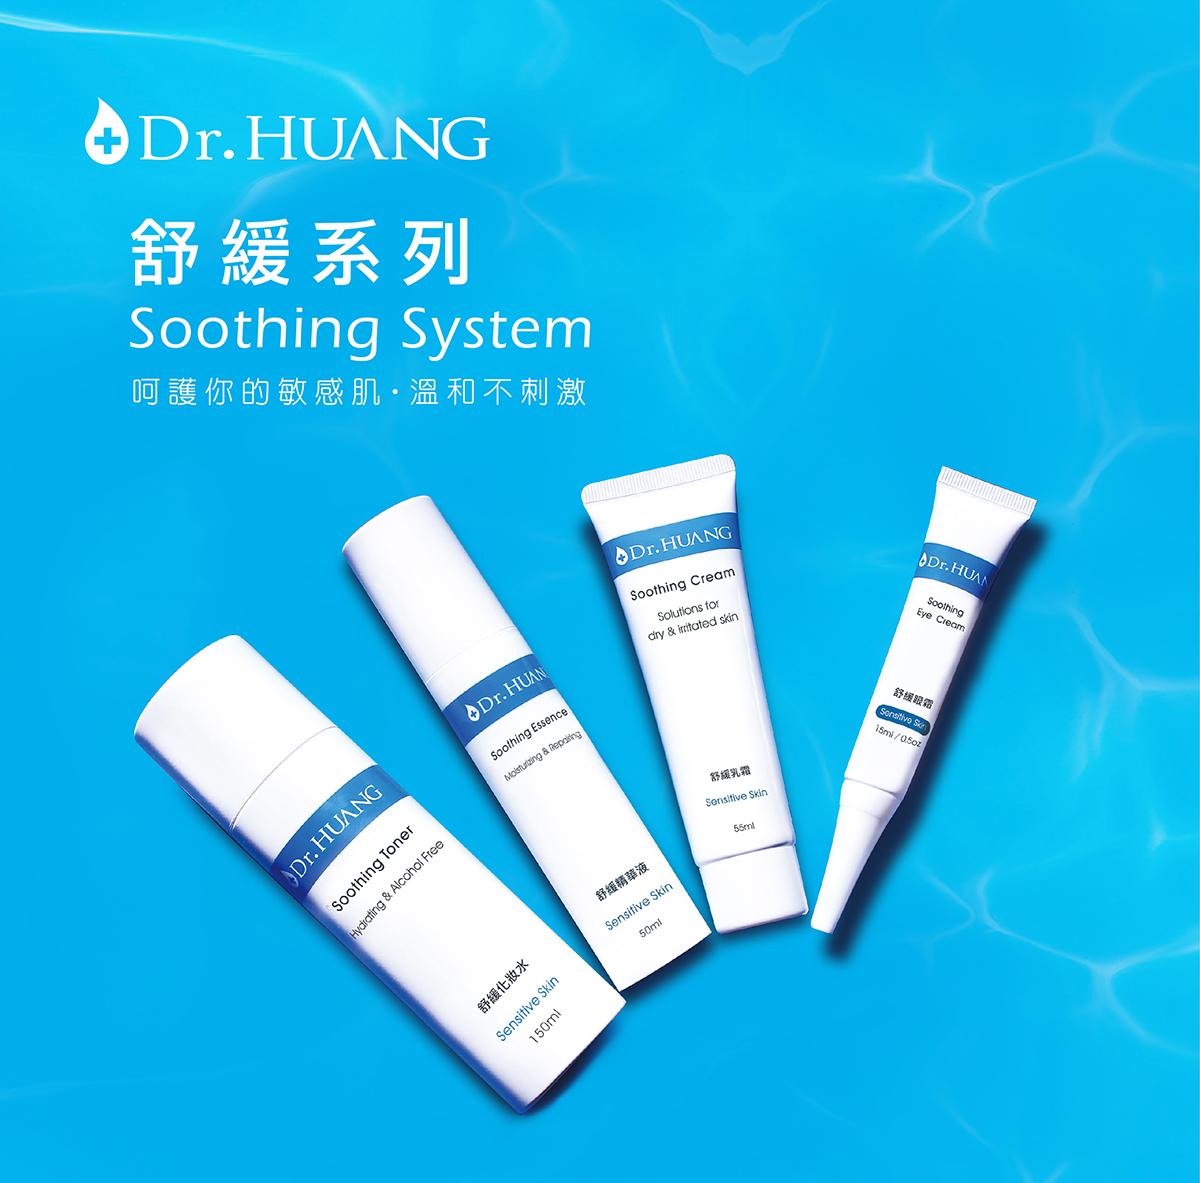 Dr.HUANG舒緩系列保養品抵抗敏弱不適